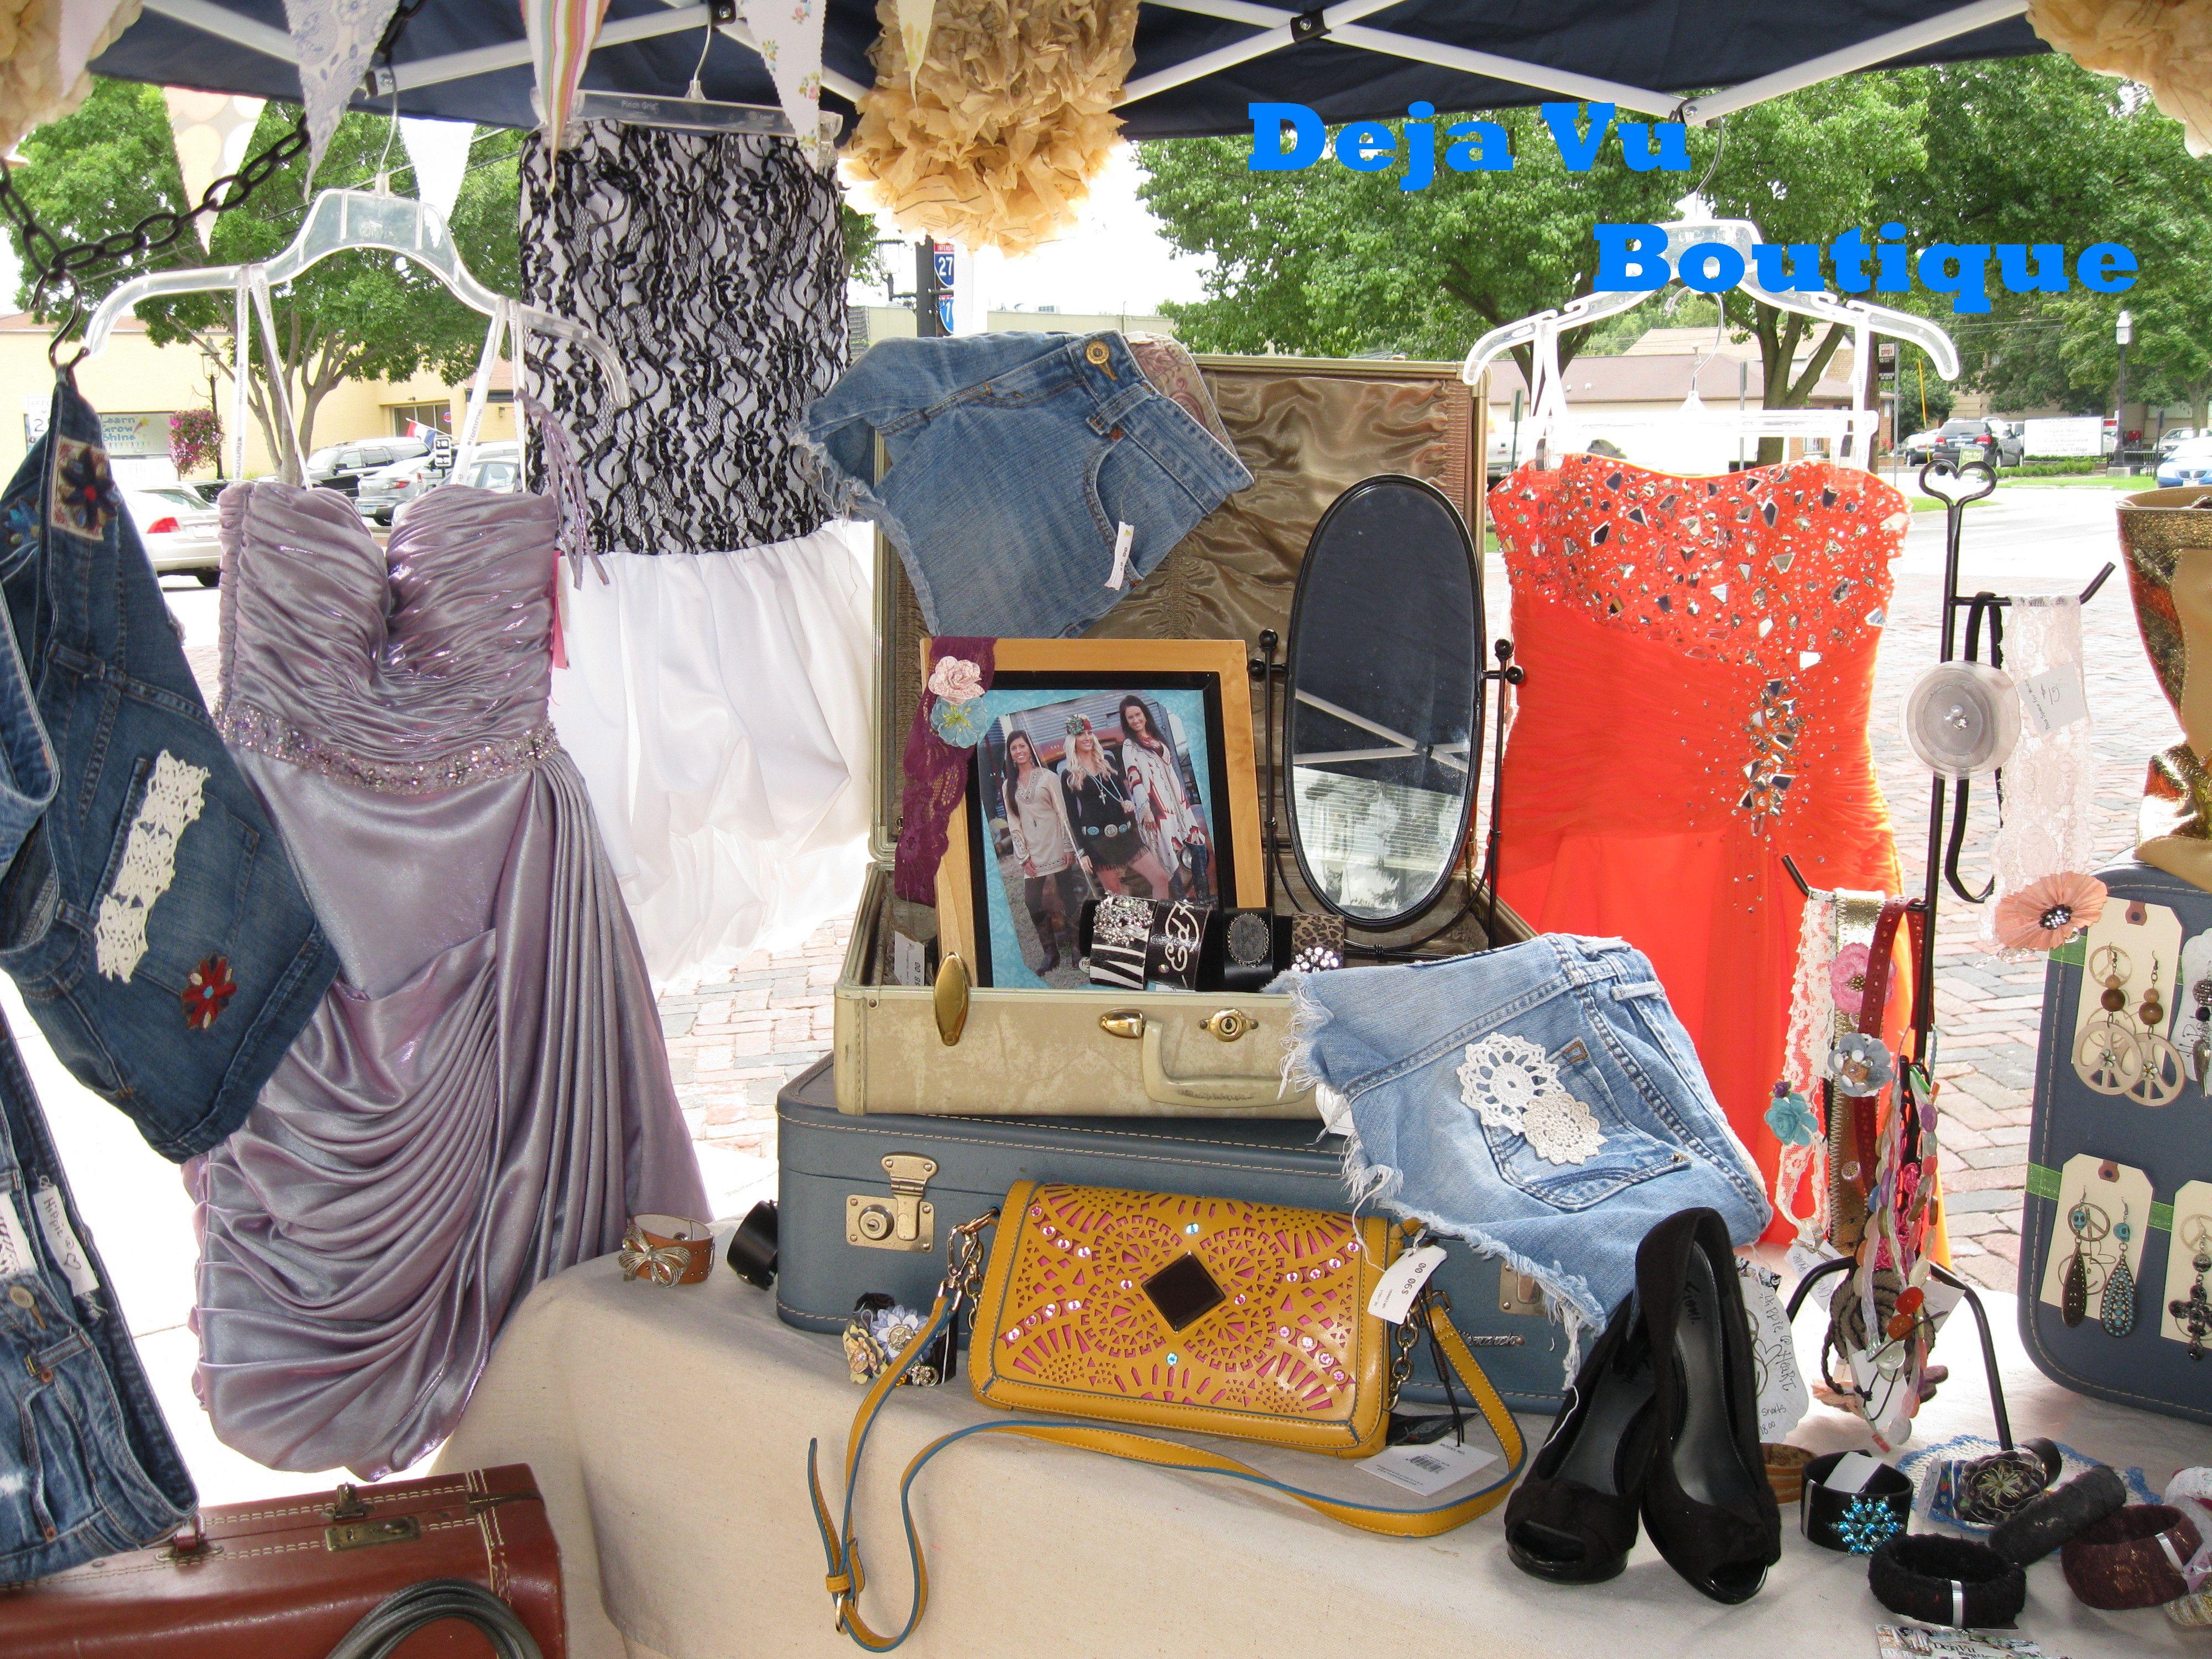 Deja Vu Boutique at the Grove City, OH Farmer's Market!